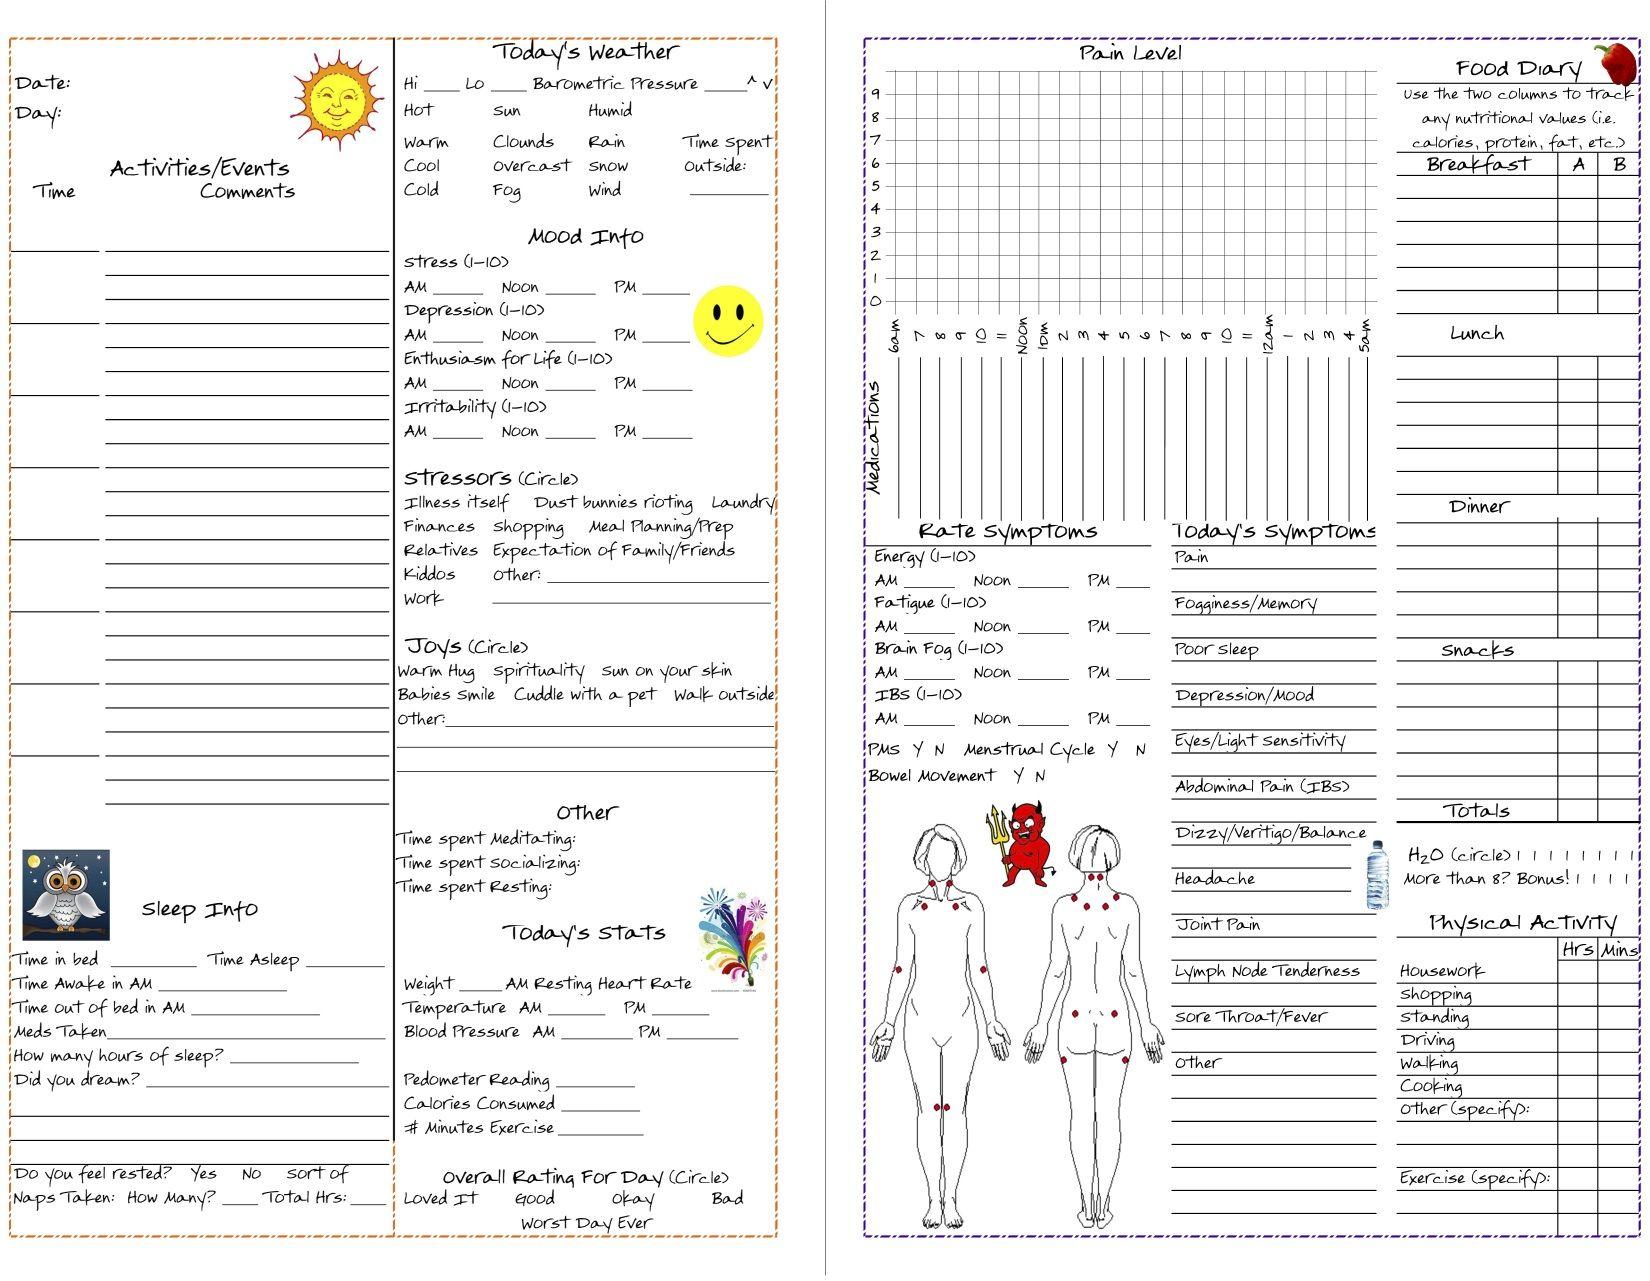 Fibromyalgia Pain Diagram Kenwood Kdc 152 Stereo Wiring Journal Want Pinterest